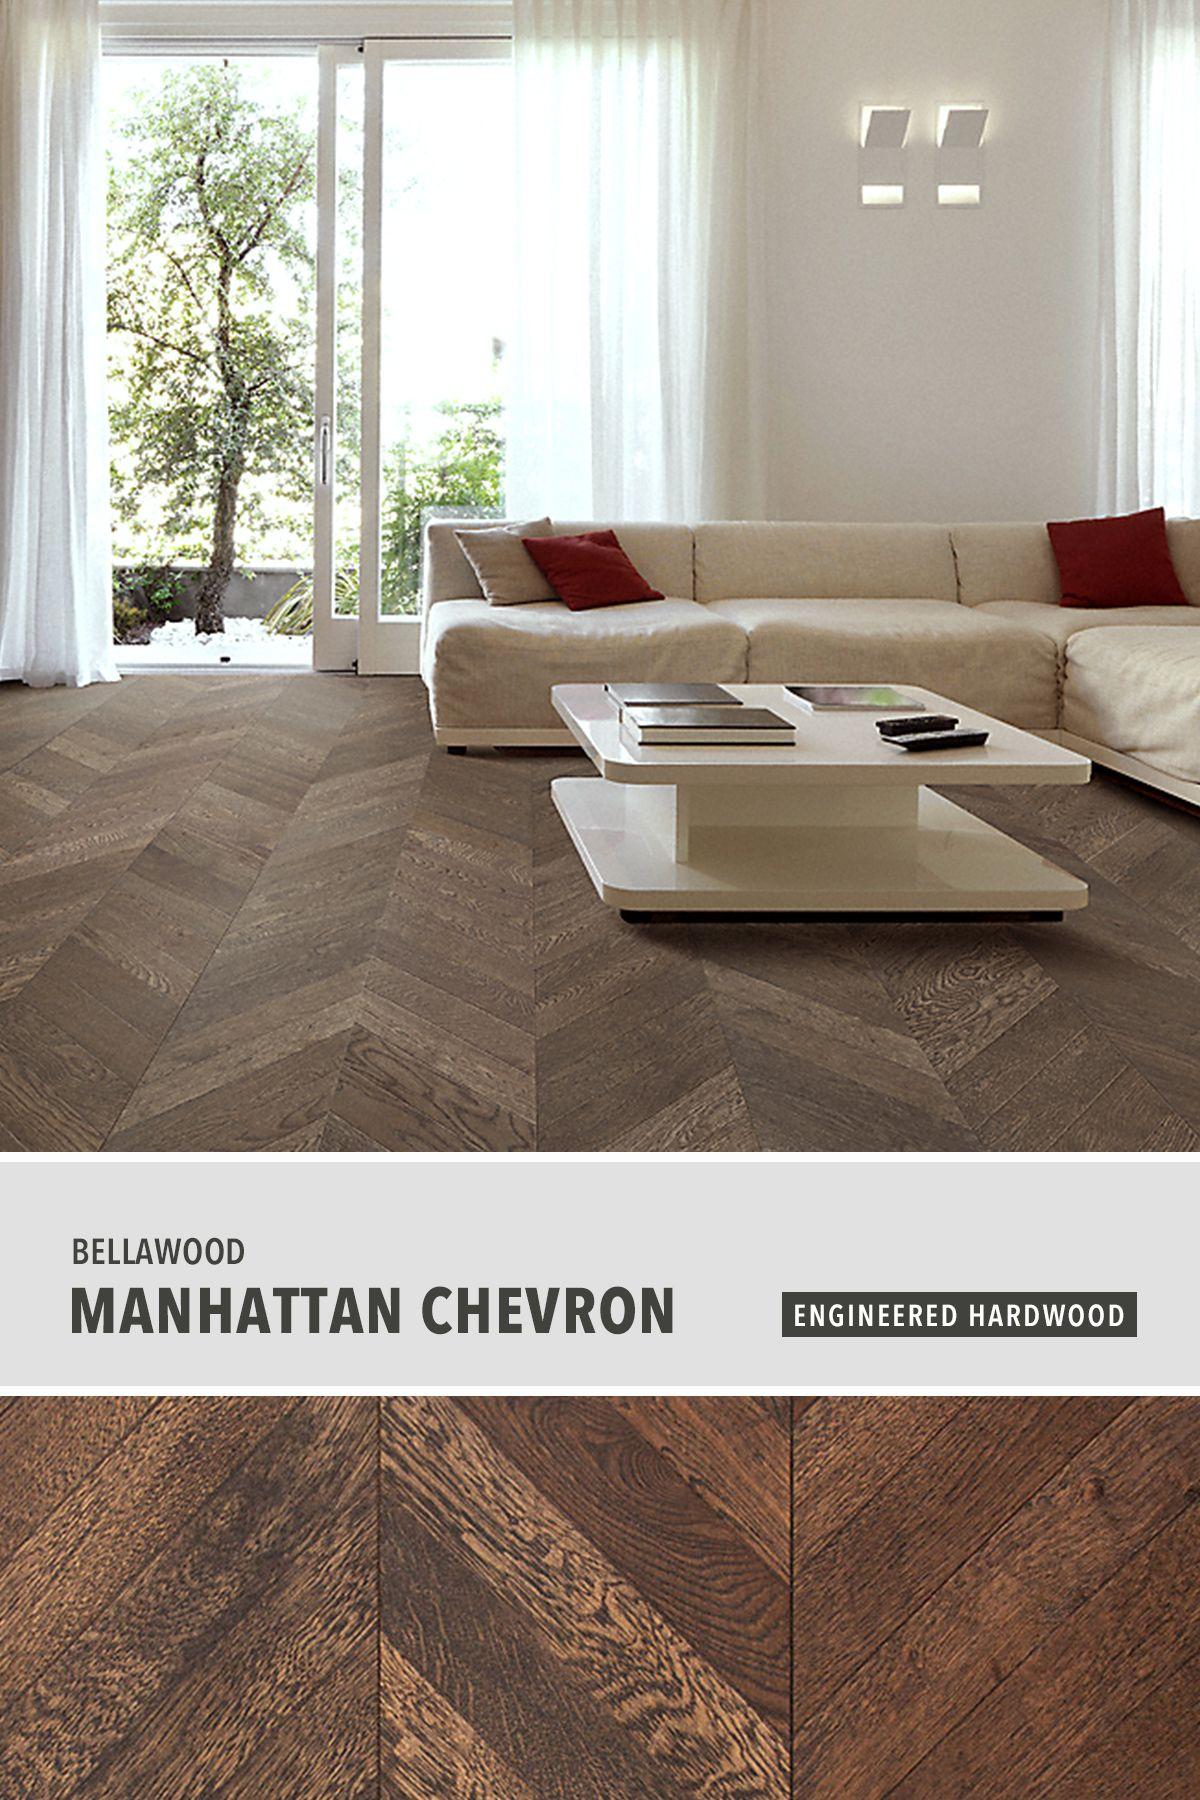 232 Best Floors Hardwood Images In 2020 Hardwood Floors